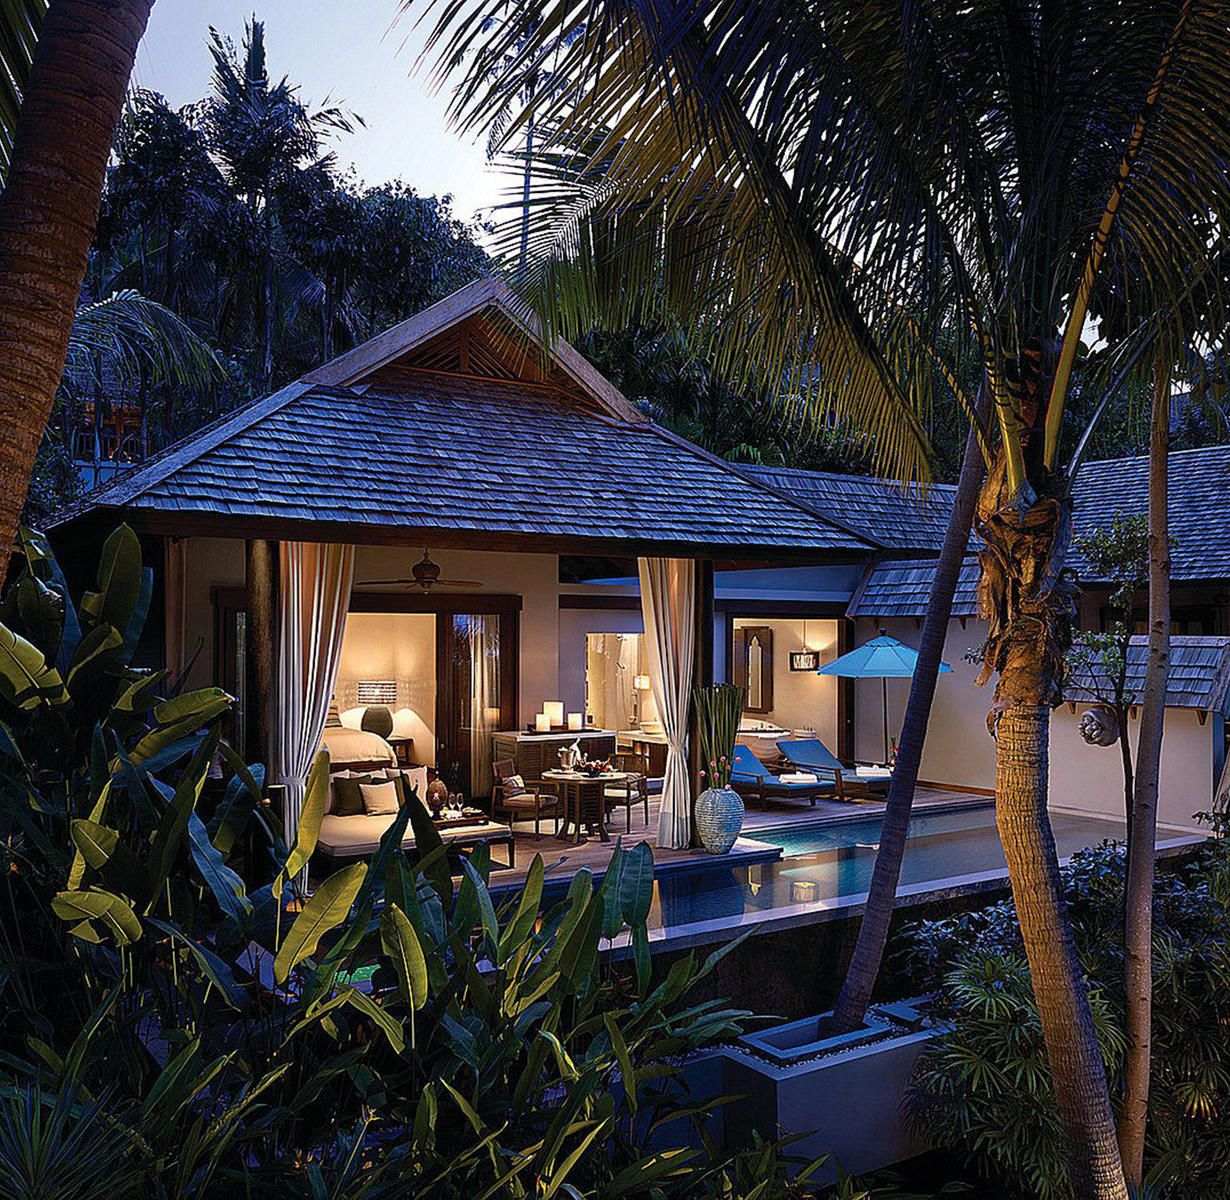 7 Luxurious Honeymoon Destinations Hotels: Four Seasons Resort Koh Samui Thailand Ang Thong, Thailand